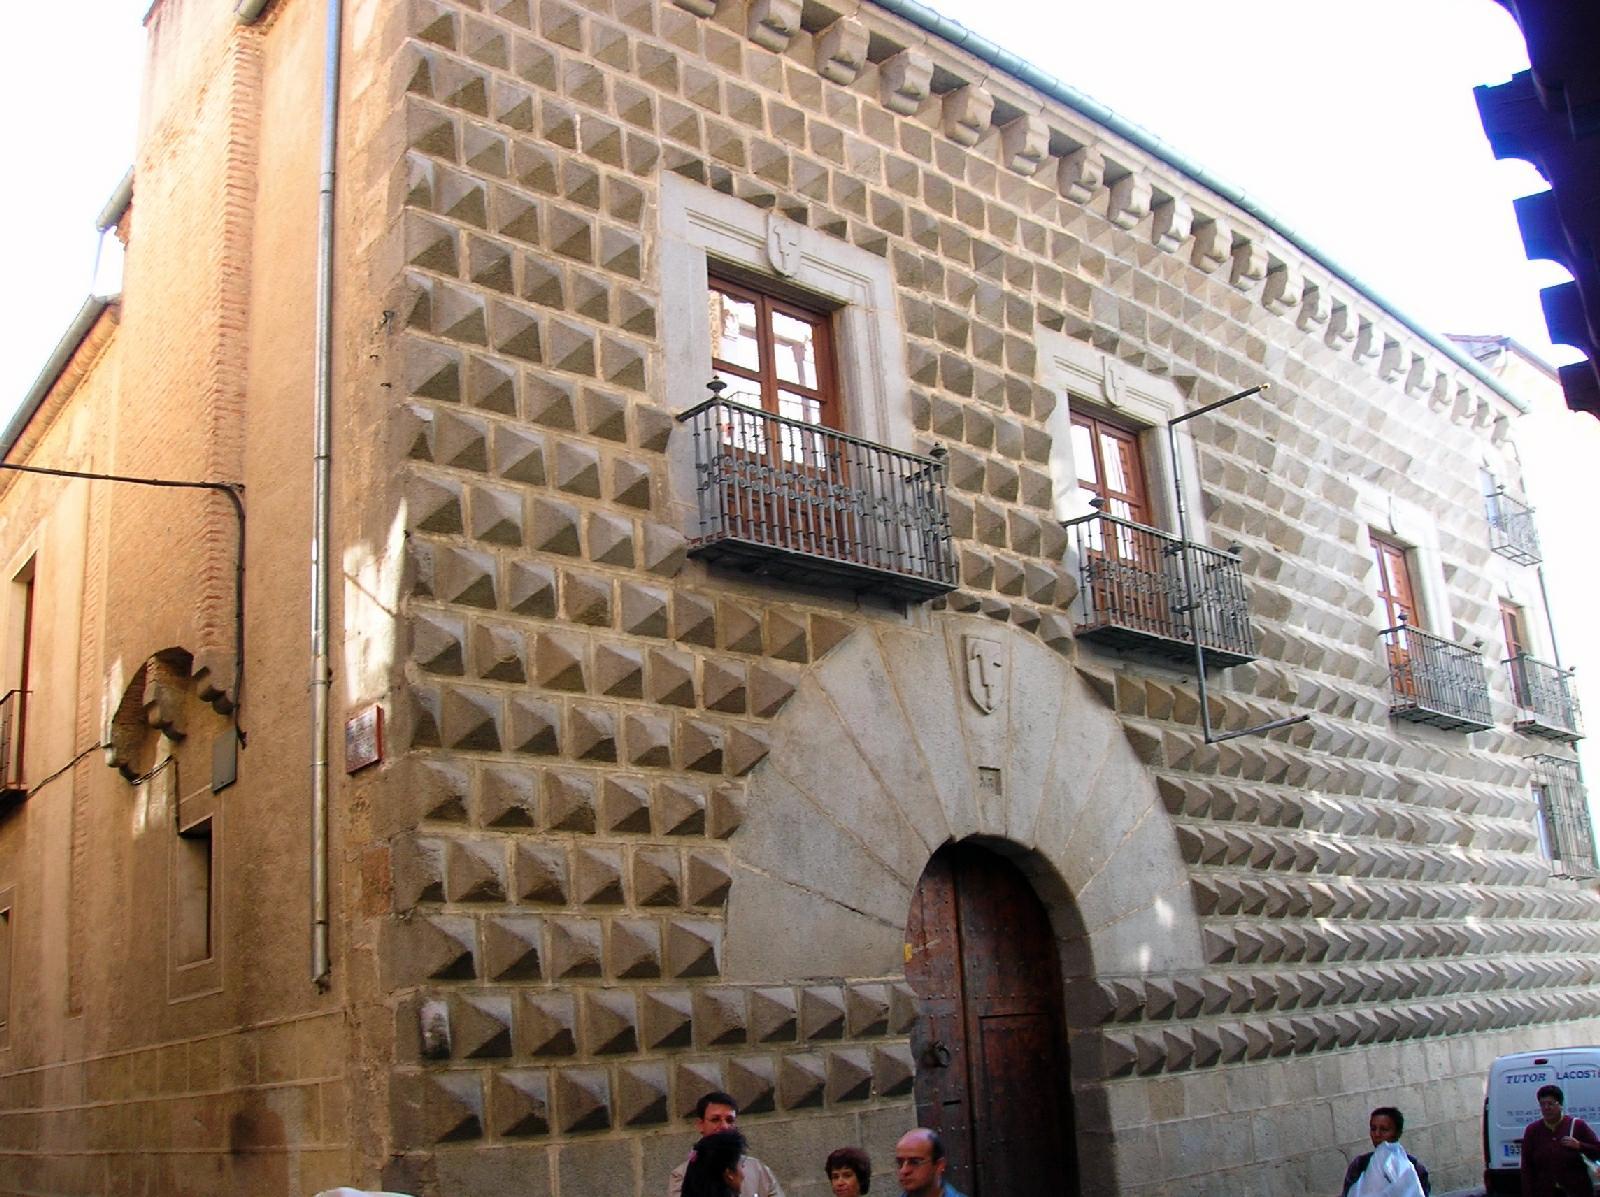 File:Segovia - Casa de los Picos 2.jpg - Wikimedia Commons